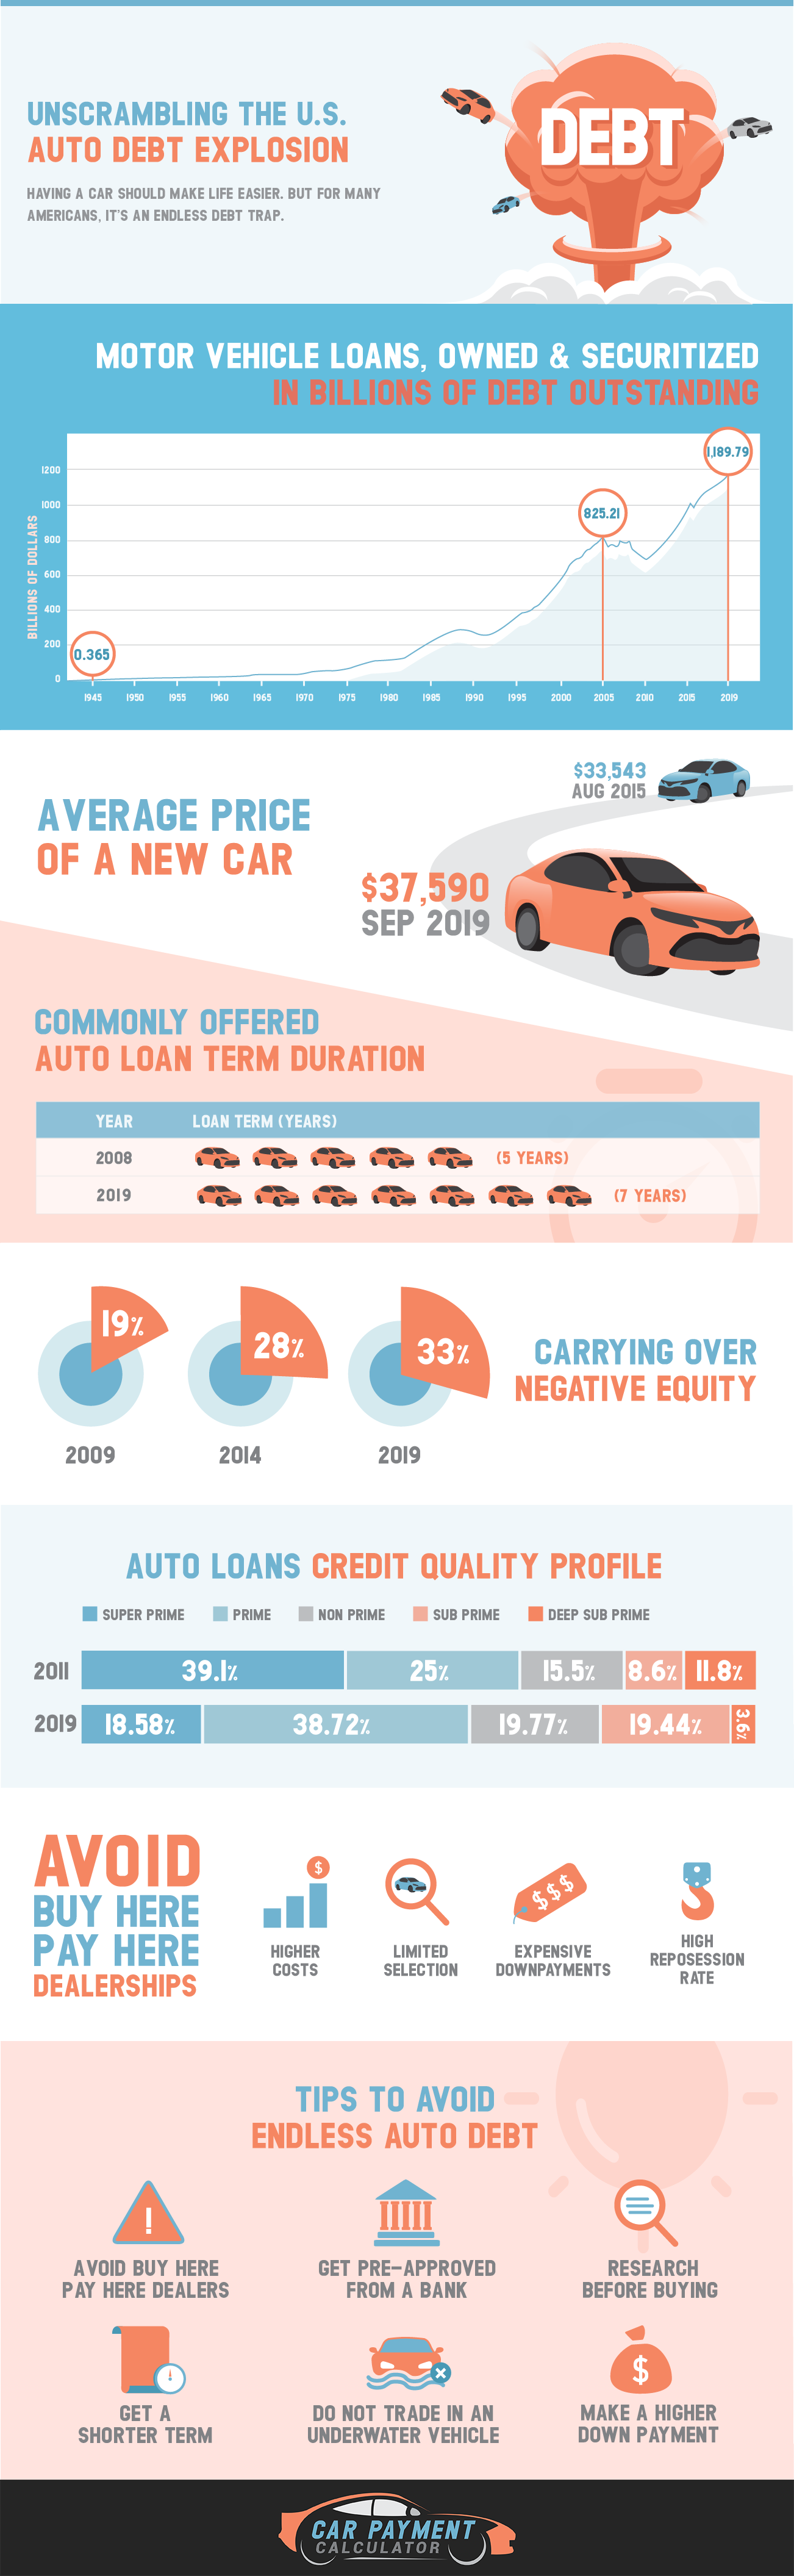 Unscrambling the U.S. Auto Debt Explosion